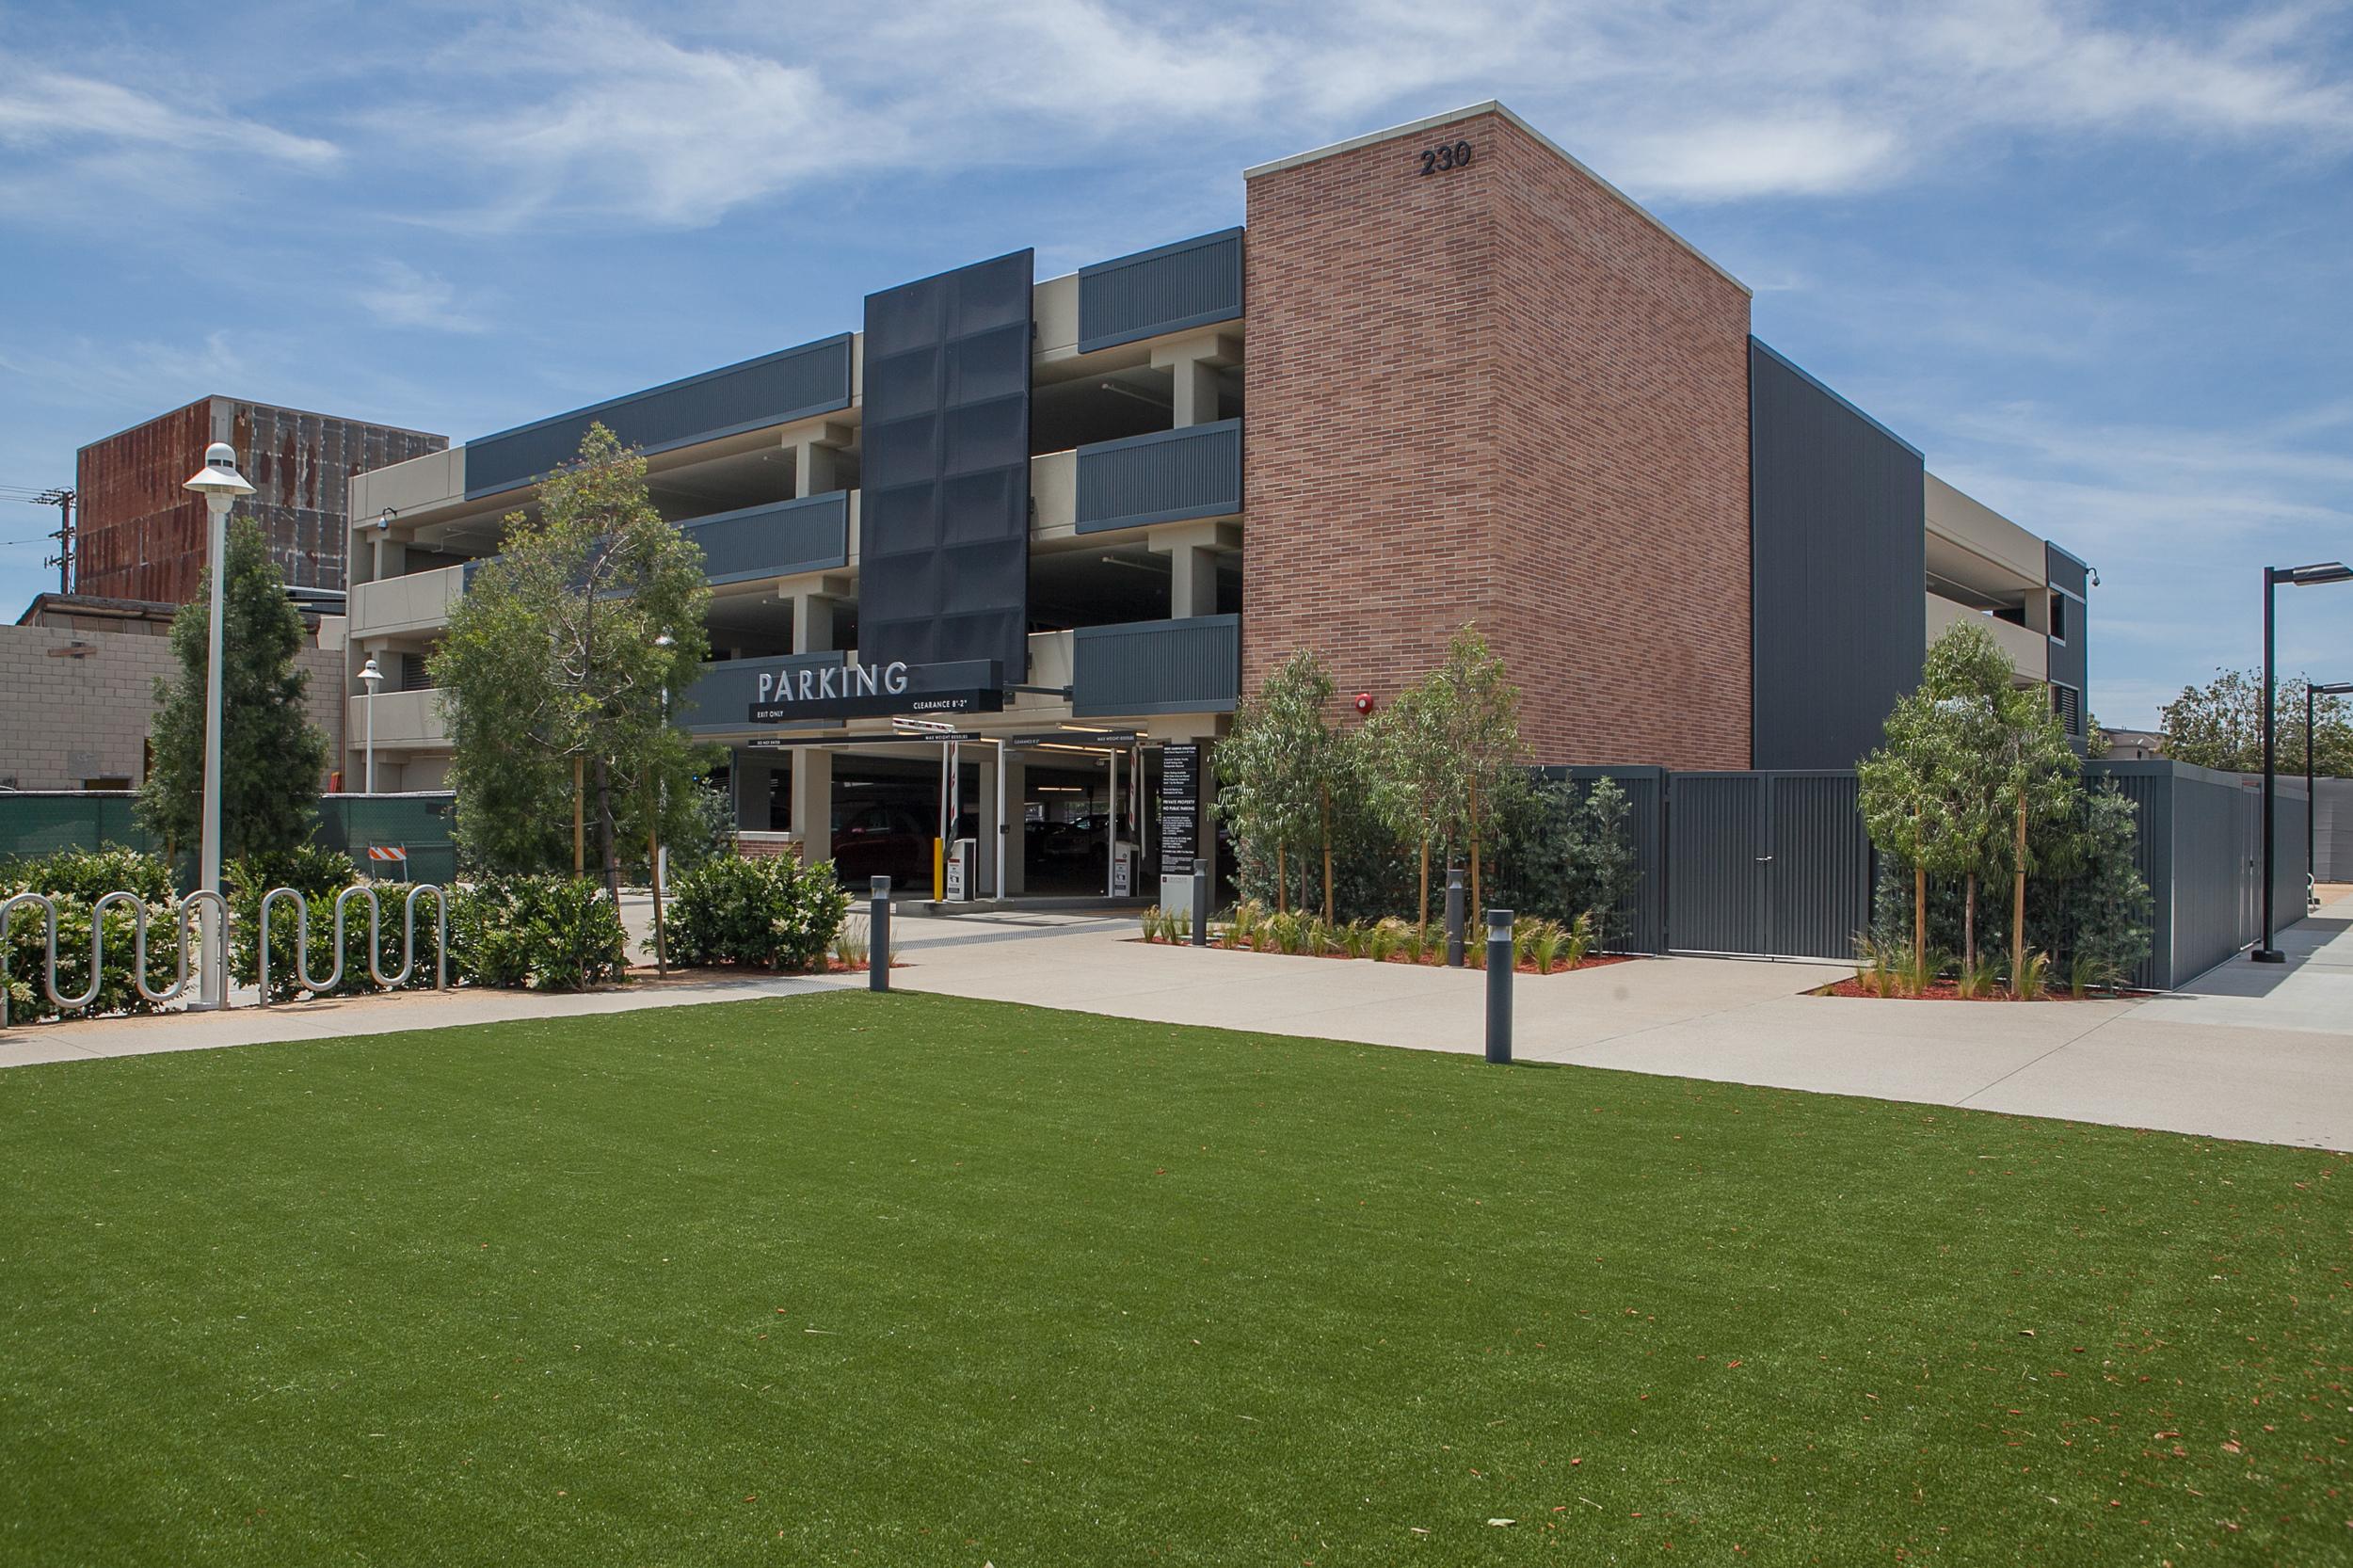 Chapman Univ Parking Structure-38.jpg